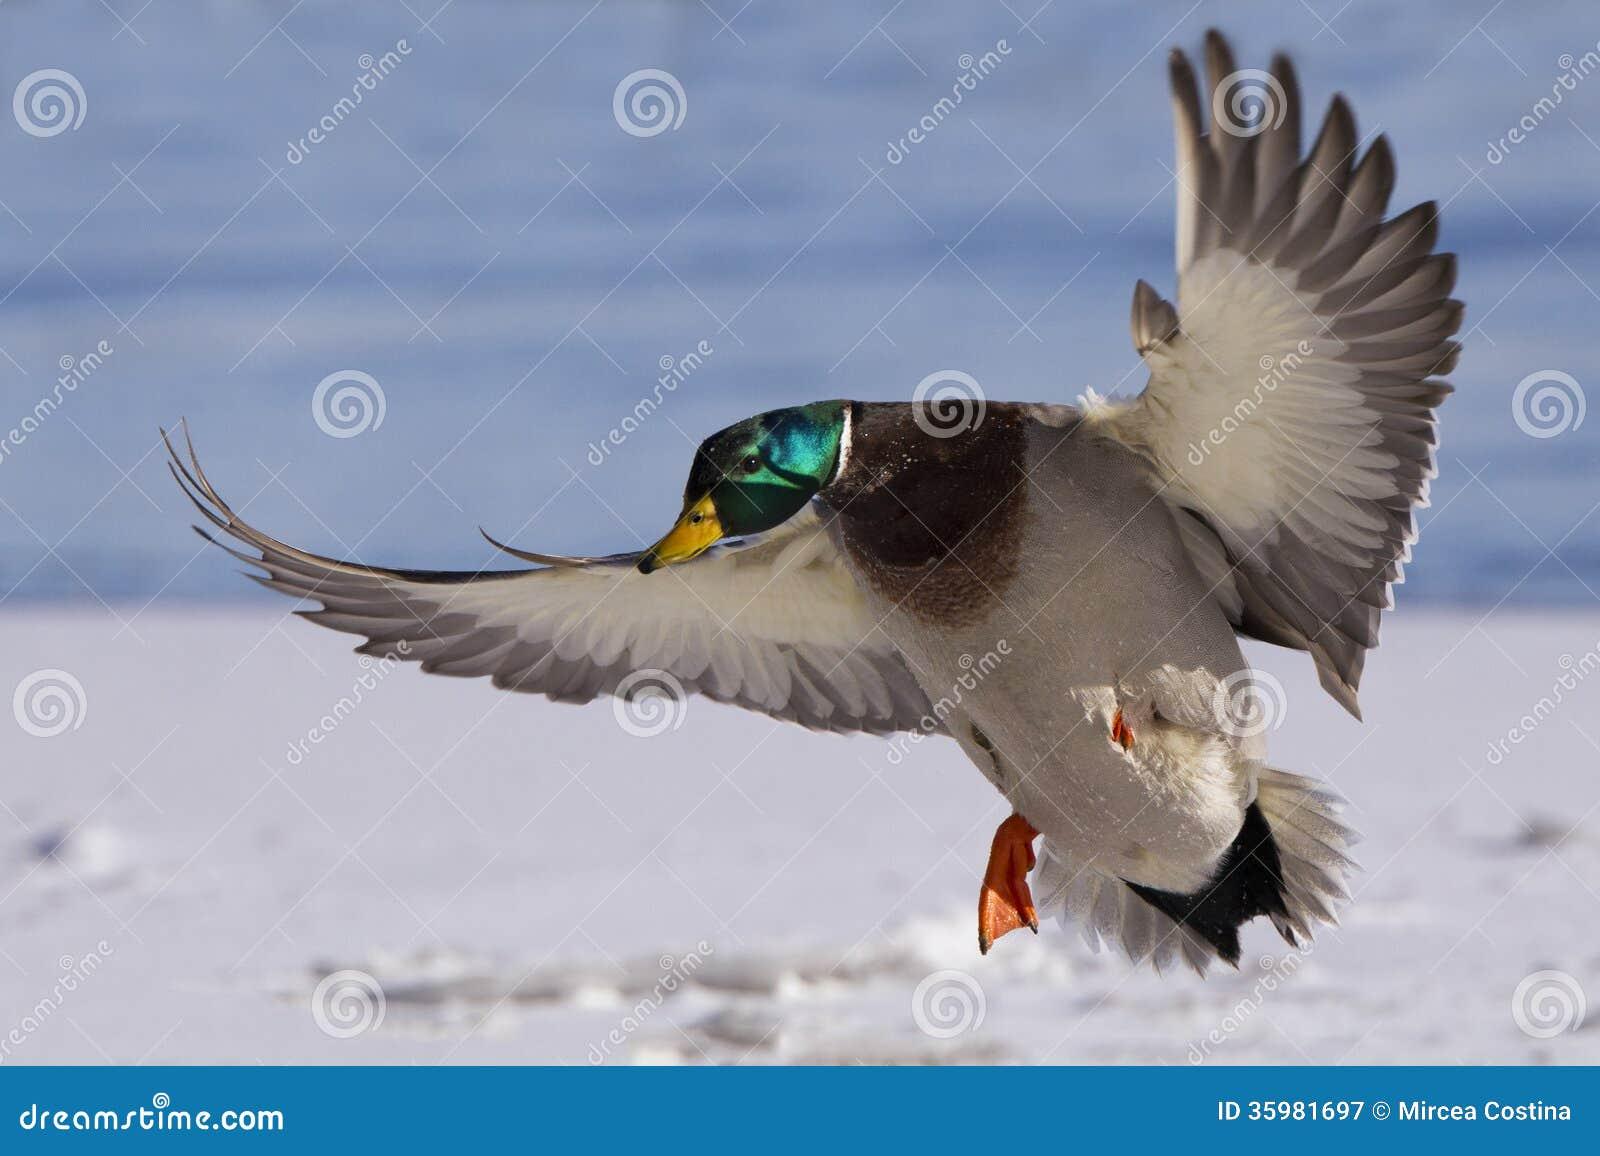 Colorful Drake Landing Stock Image Image Of Ready